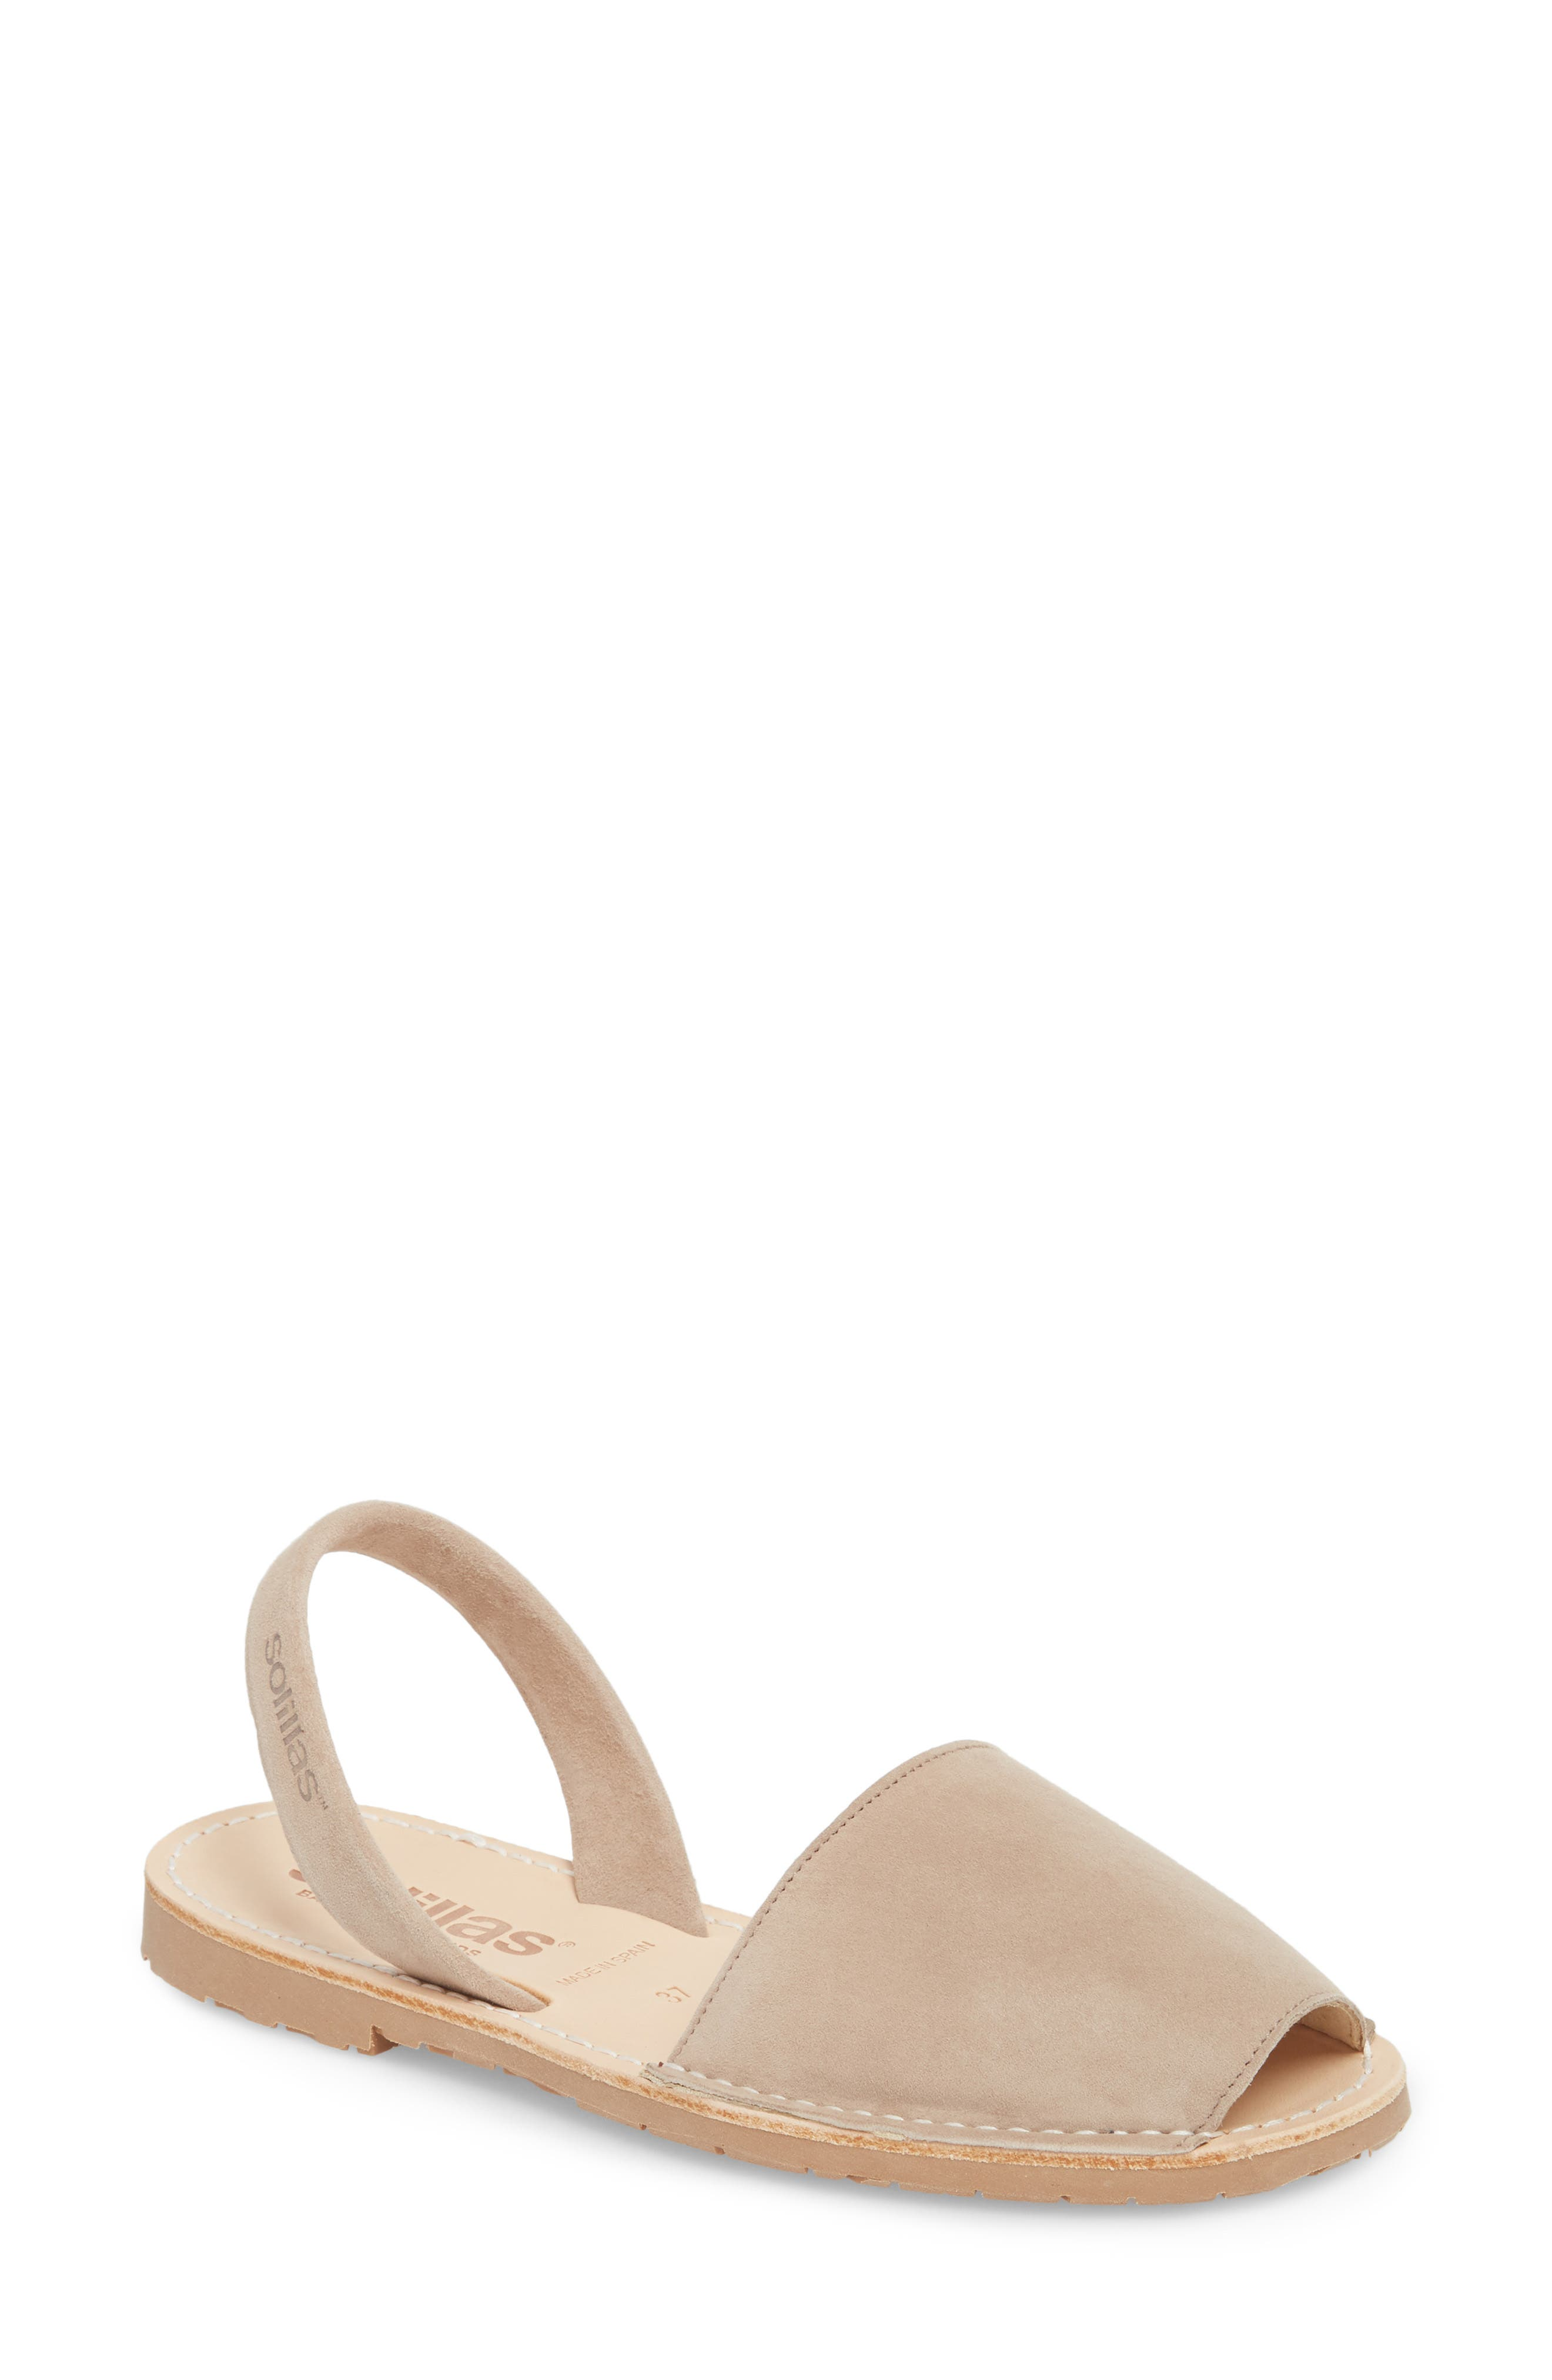 Flat Sandal,                         Main,                         color, TAUPE